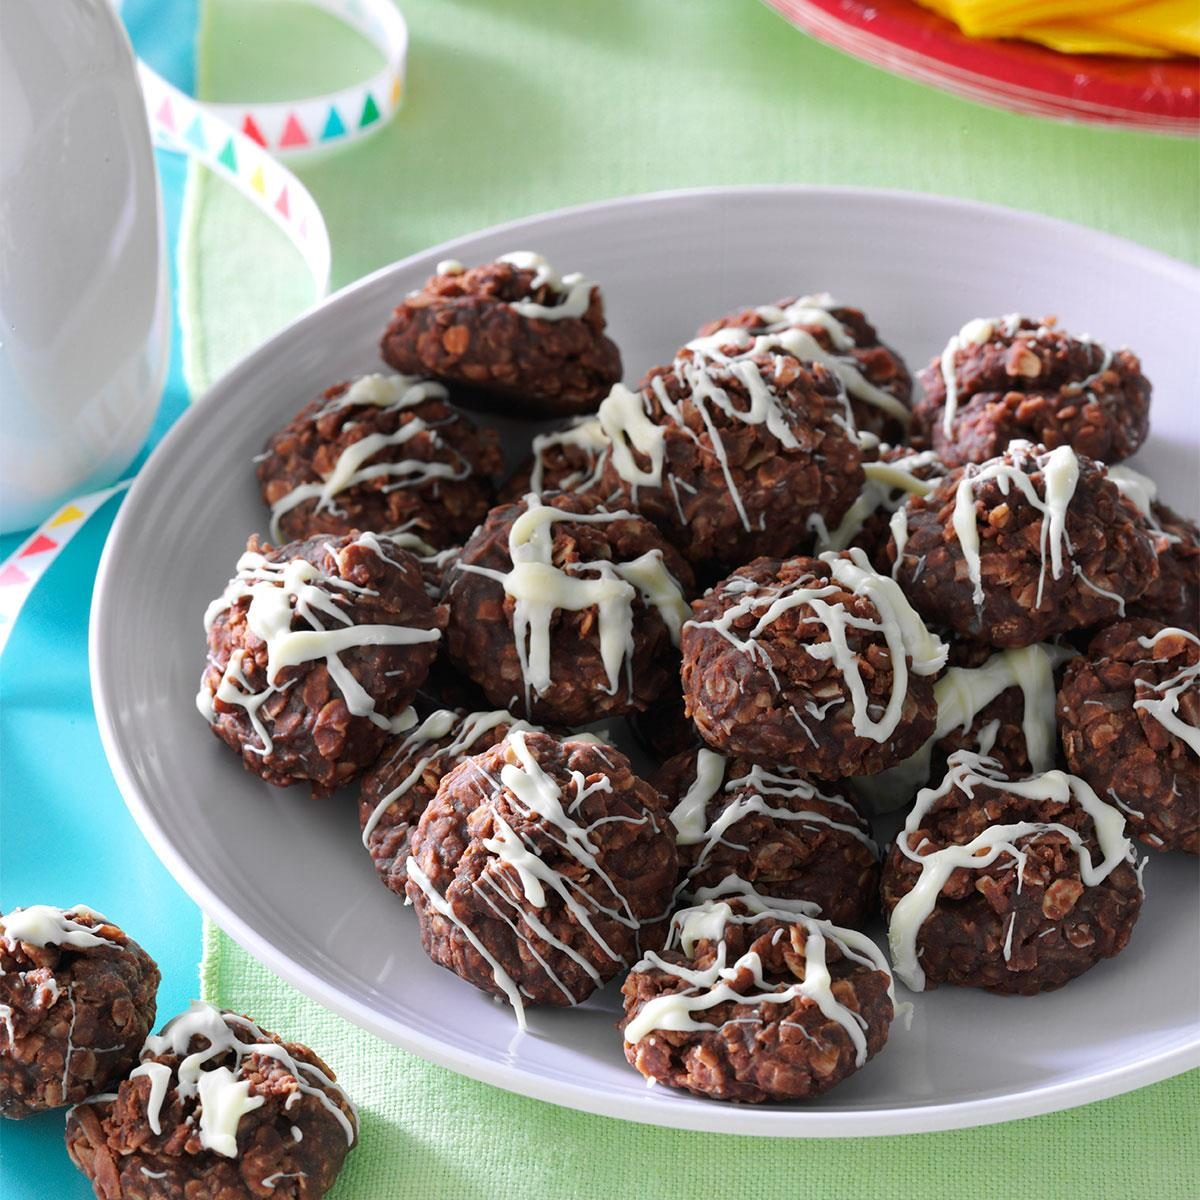 18 Chocolate No-Bake Cookies